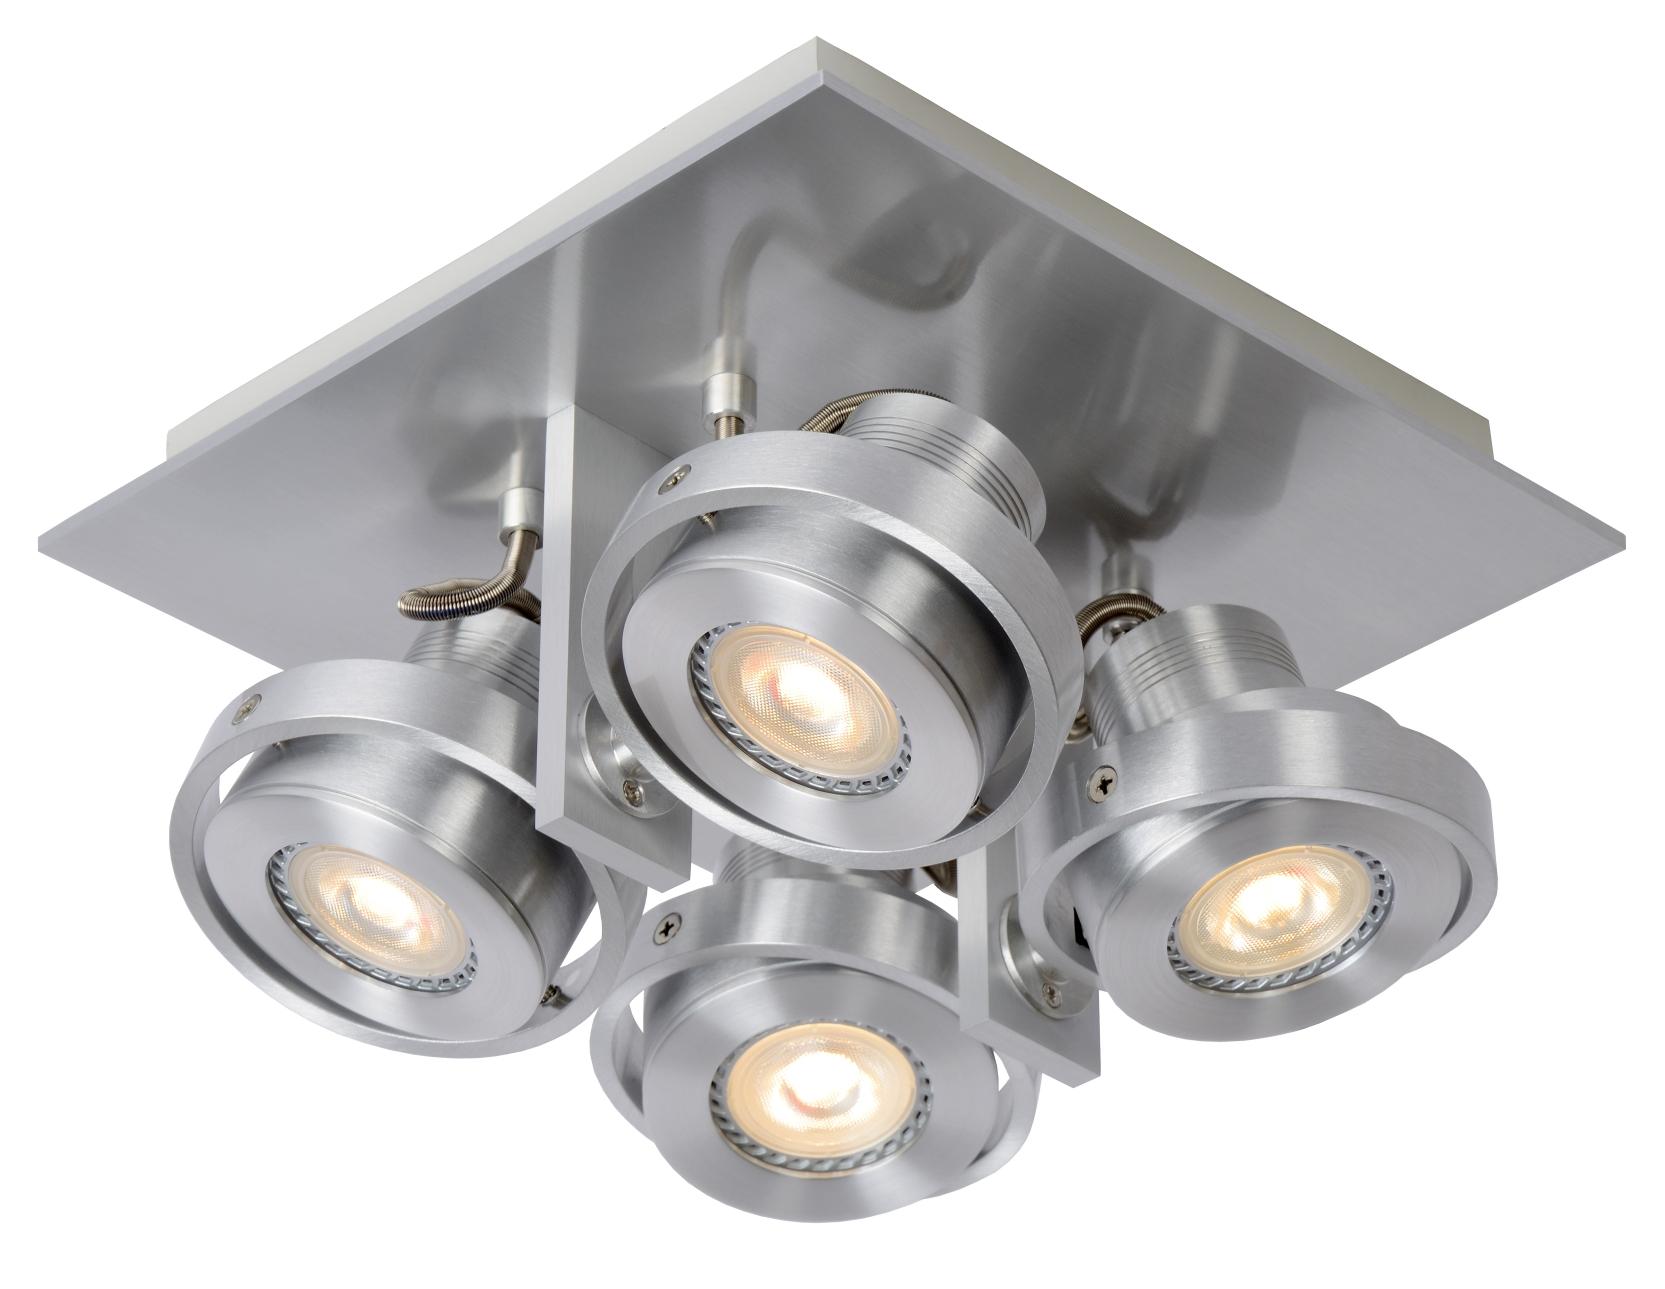 Lucide Plafondspot Landa 4-Lichts - Dimbare LED - Aluminium